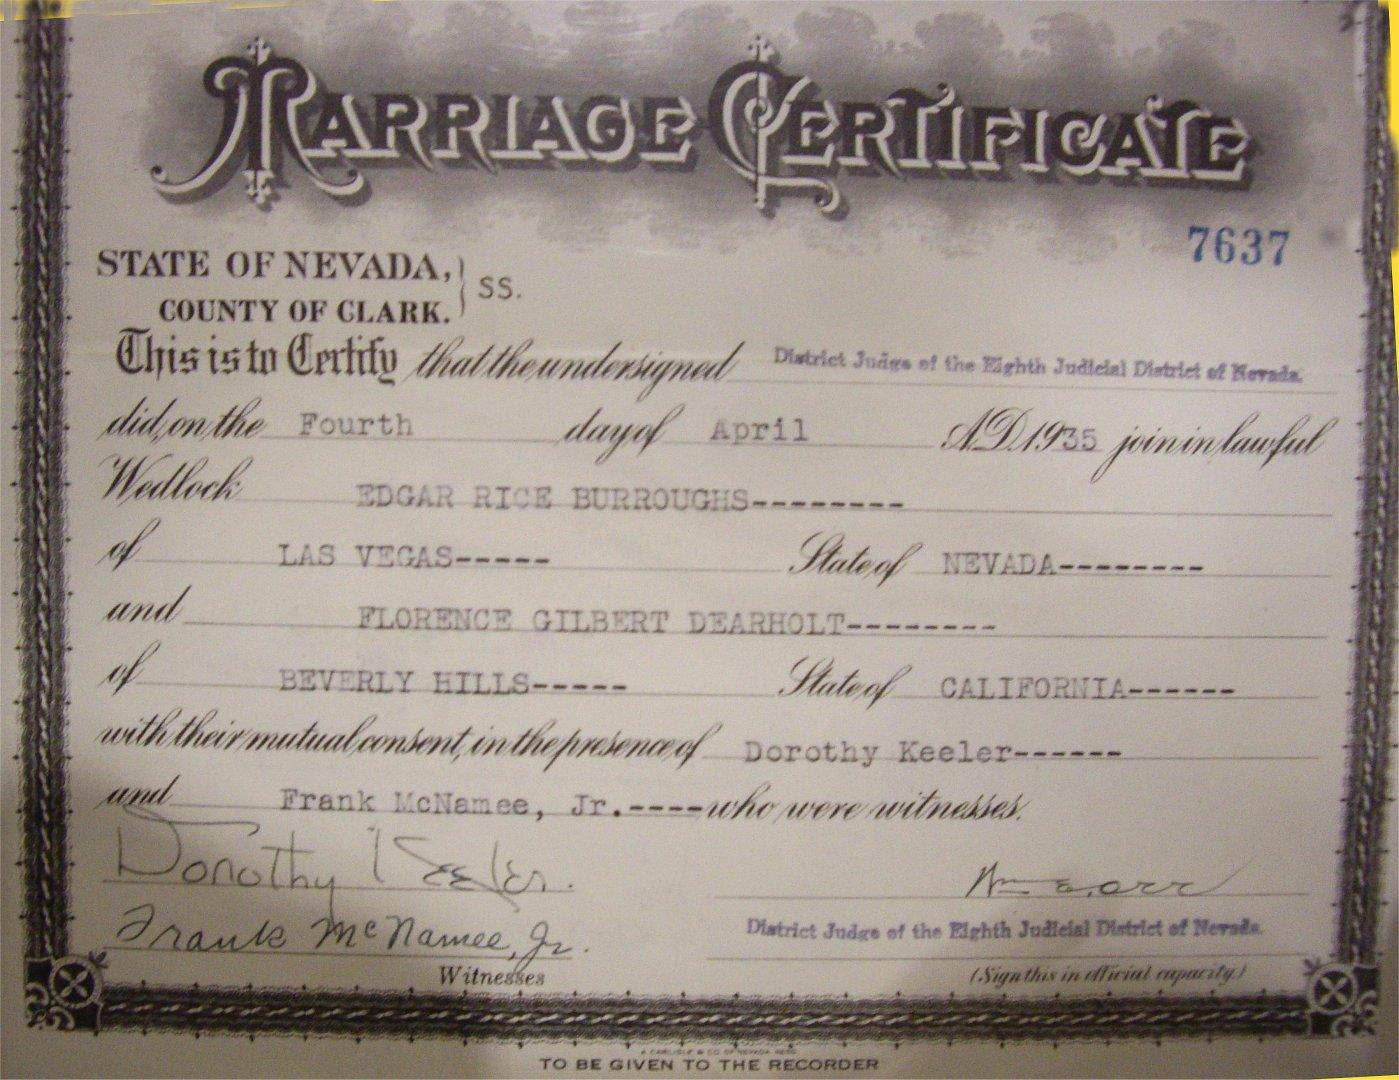 Erbzine 4119 lee chase erb photos marriage certificate april 4 1935 las vegas 1betcityfo Gallery